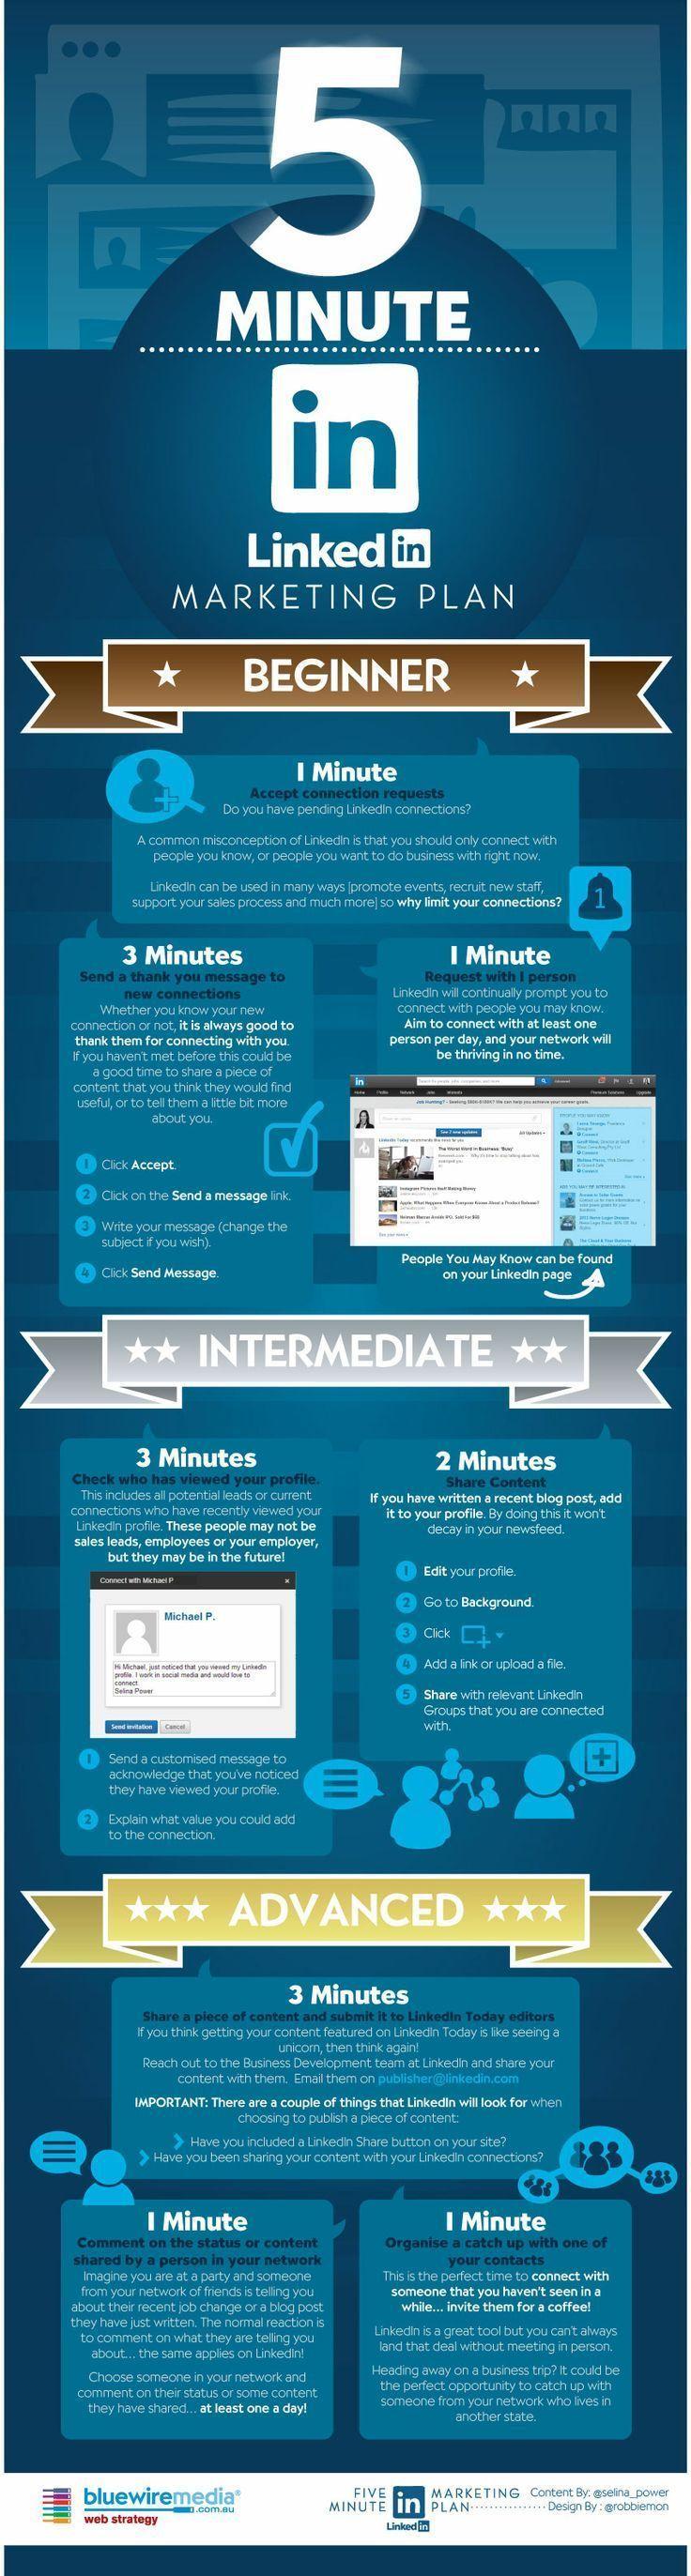 Social Media Keyboard Shortcuts Guide | LinkedIn Tips